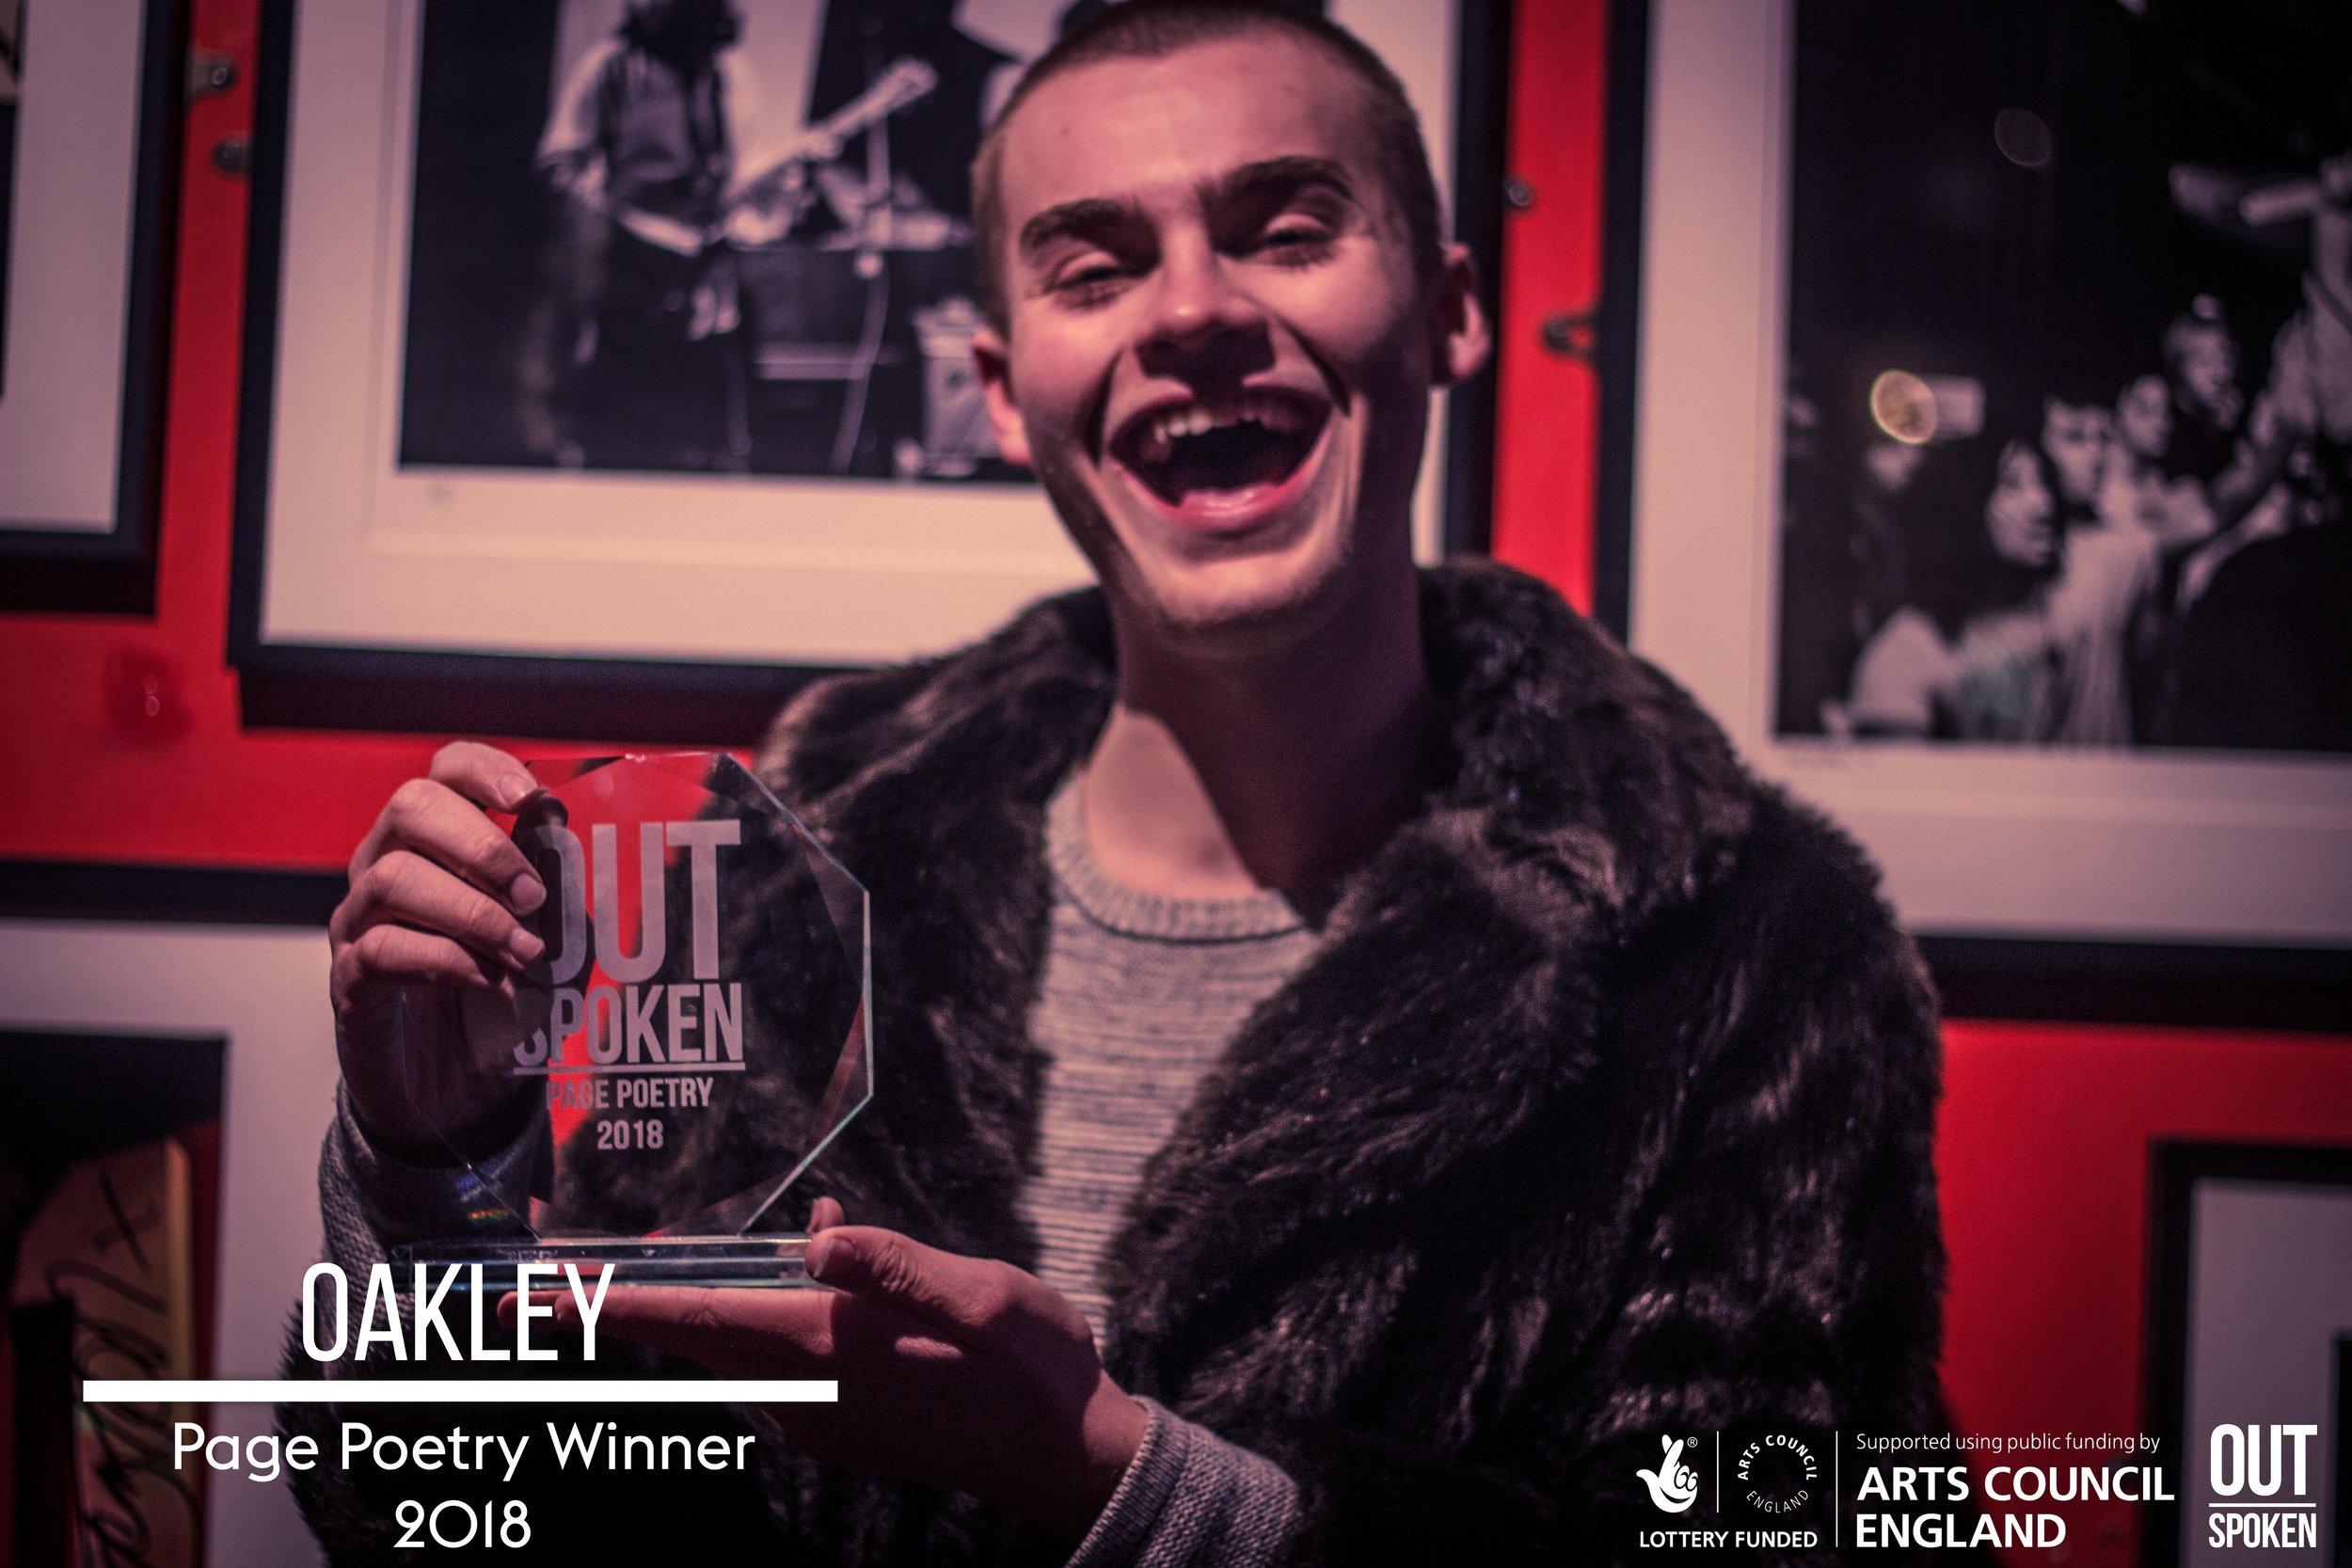 Page Winner: Oakley - Click to read poem